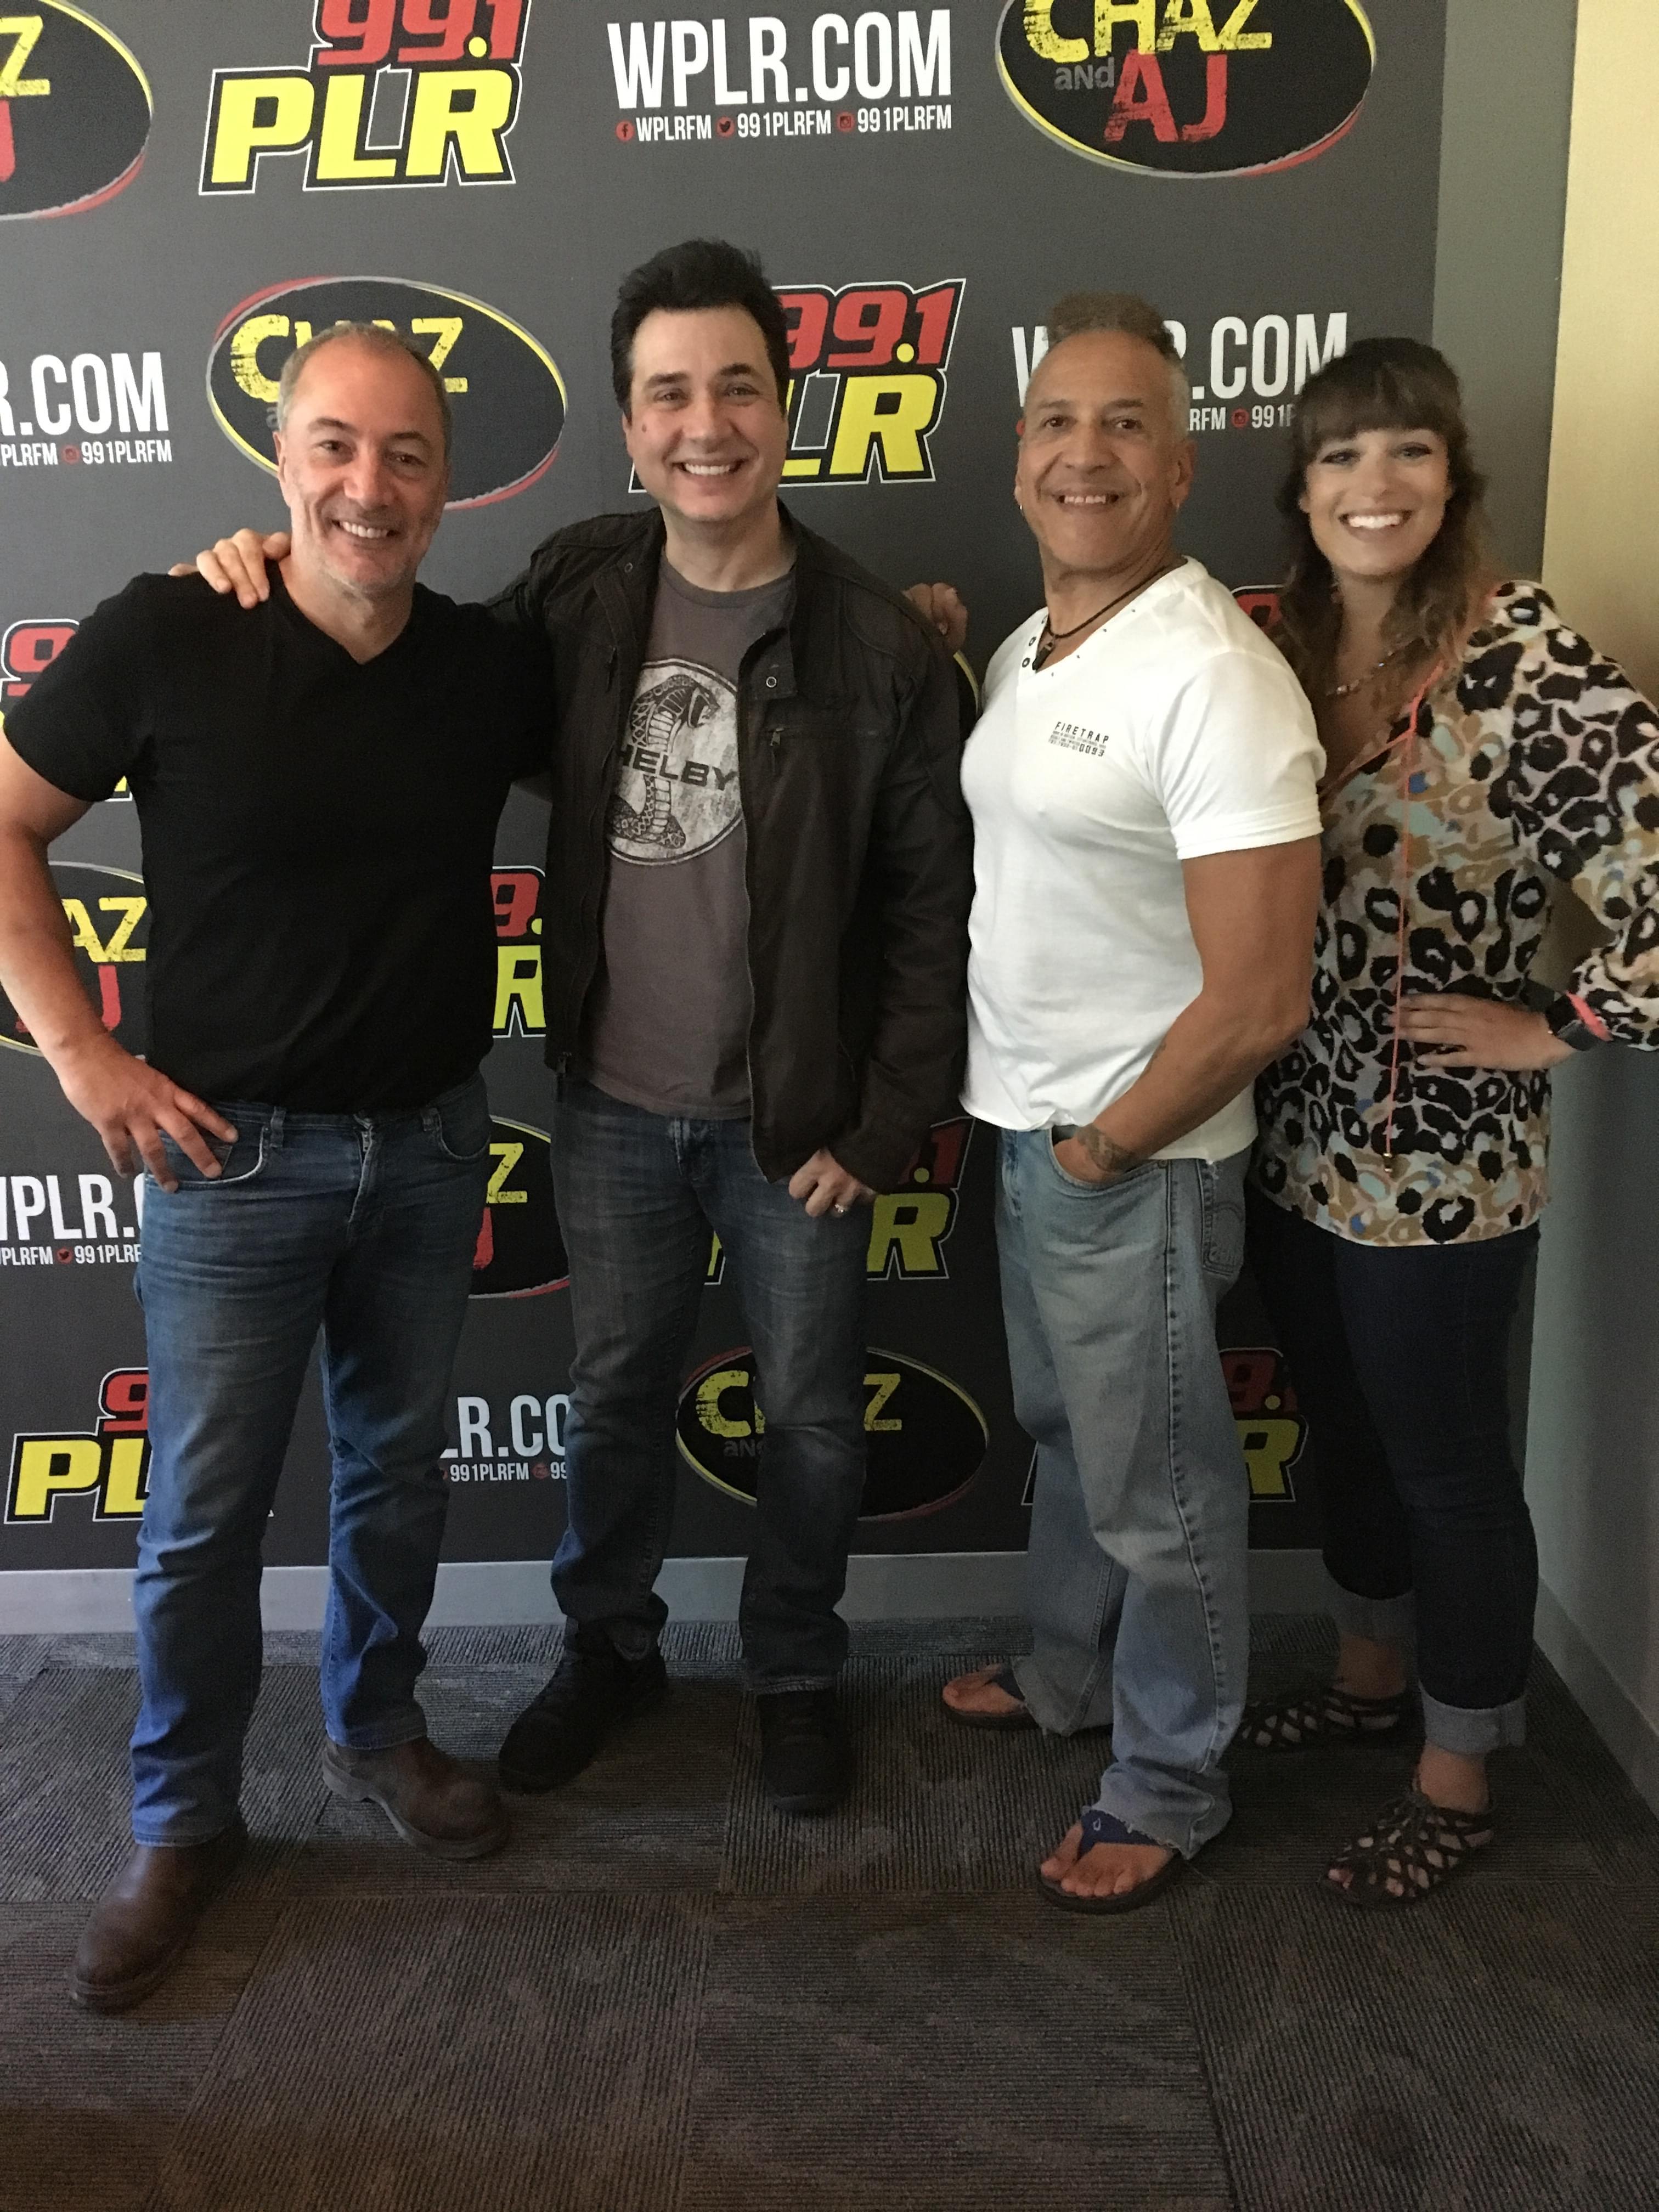 PODCAST – Monday, June 24: Adam Ferrara Stops By, A Hot Air Balloon Crash, And AJ's Sleeping Set Up